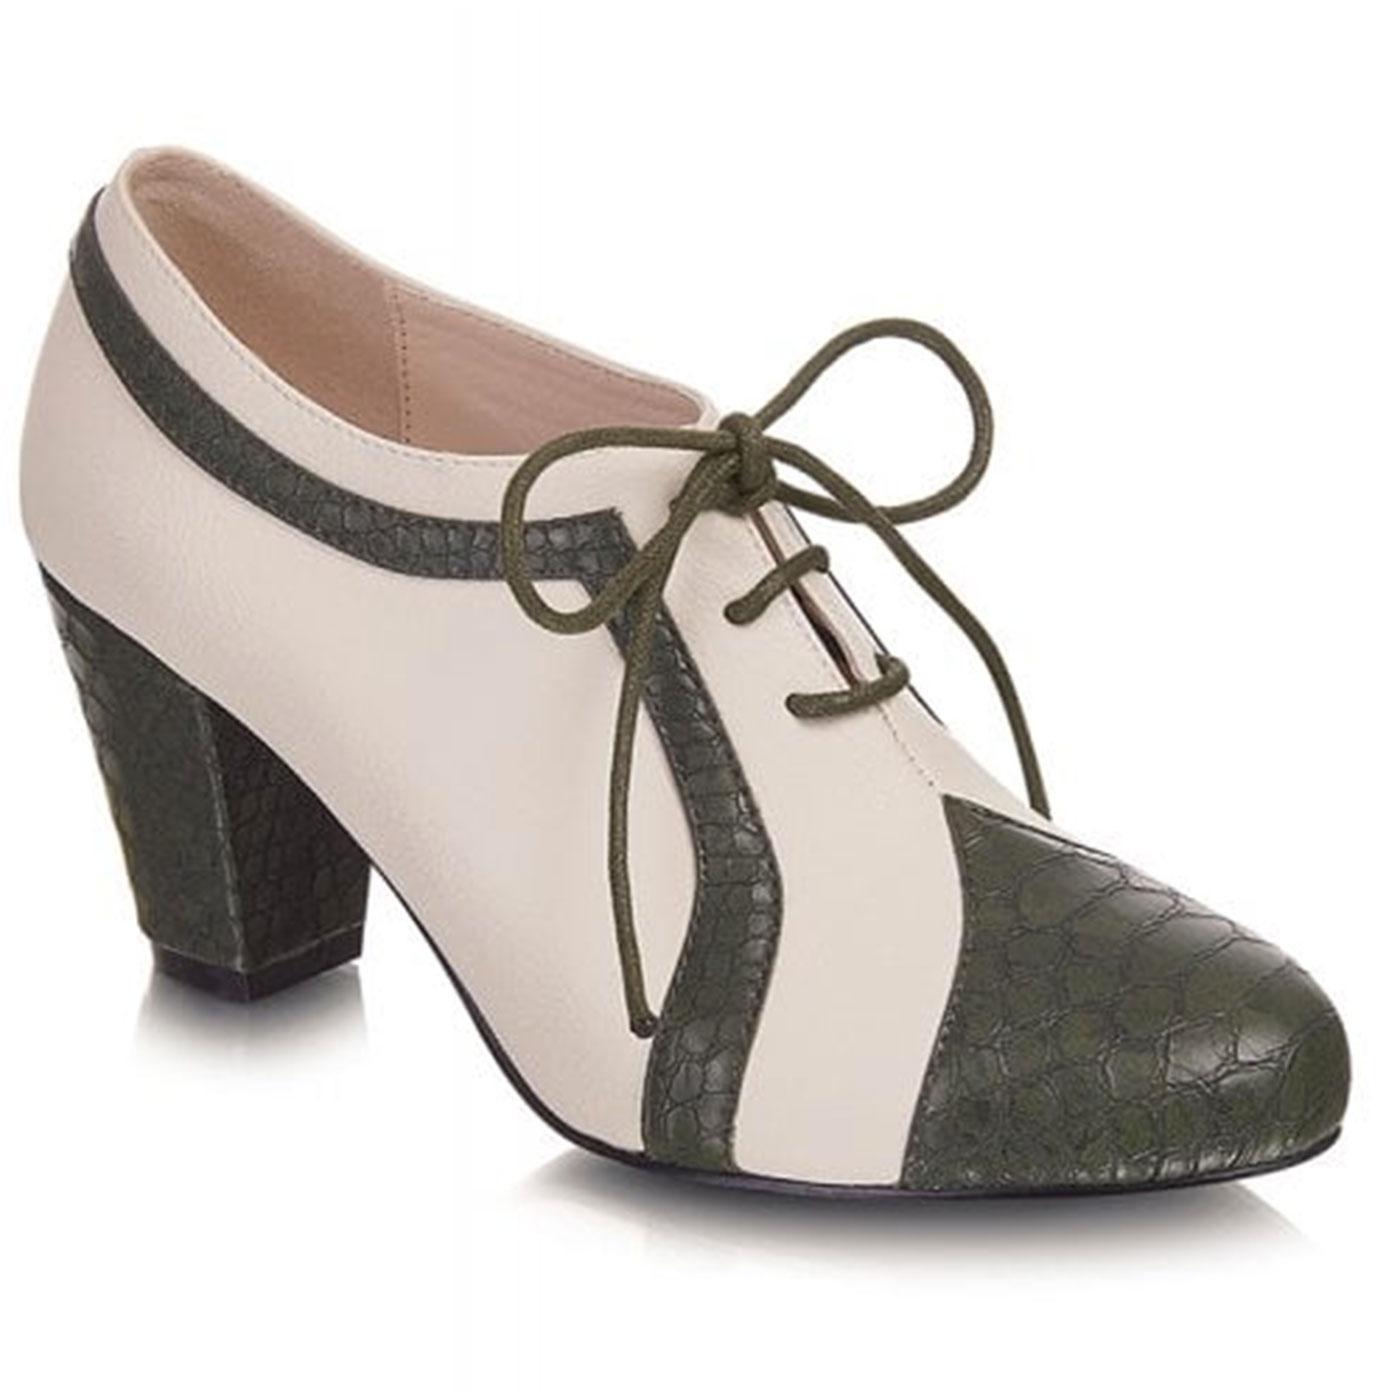 Amelia LULU HUN Vintage 1940s Heels Green/Ivory